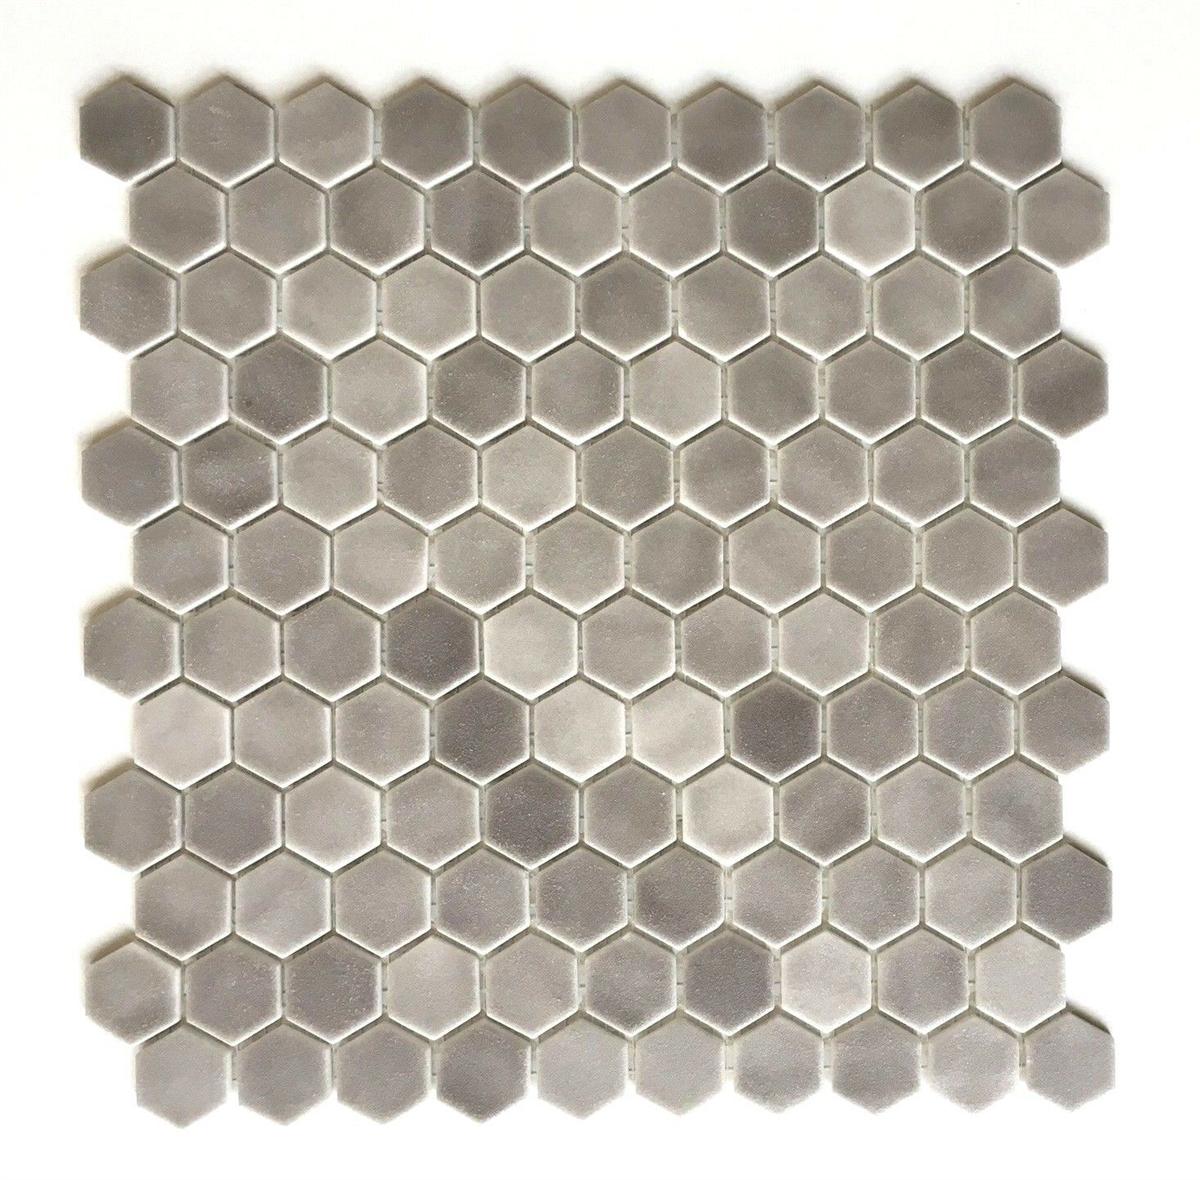 1 Quot Daltile Hexagon Matte Frost Moka Glass Mosaic Tile